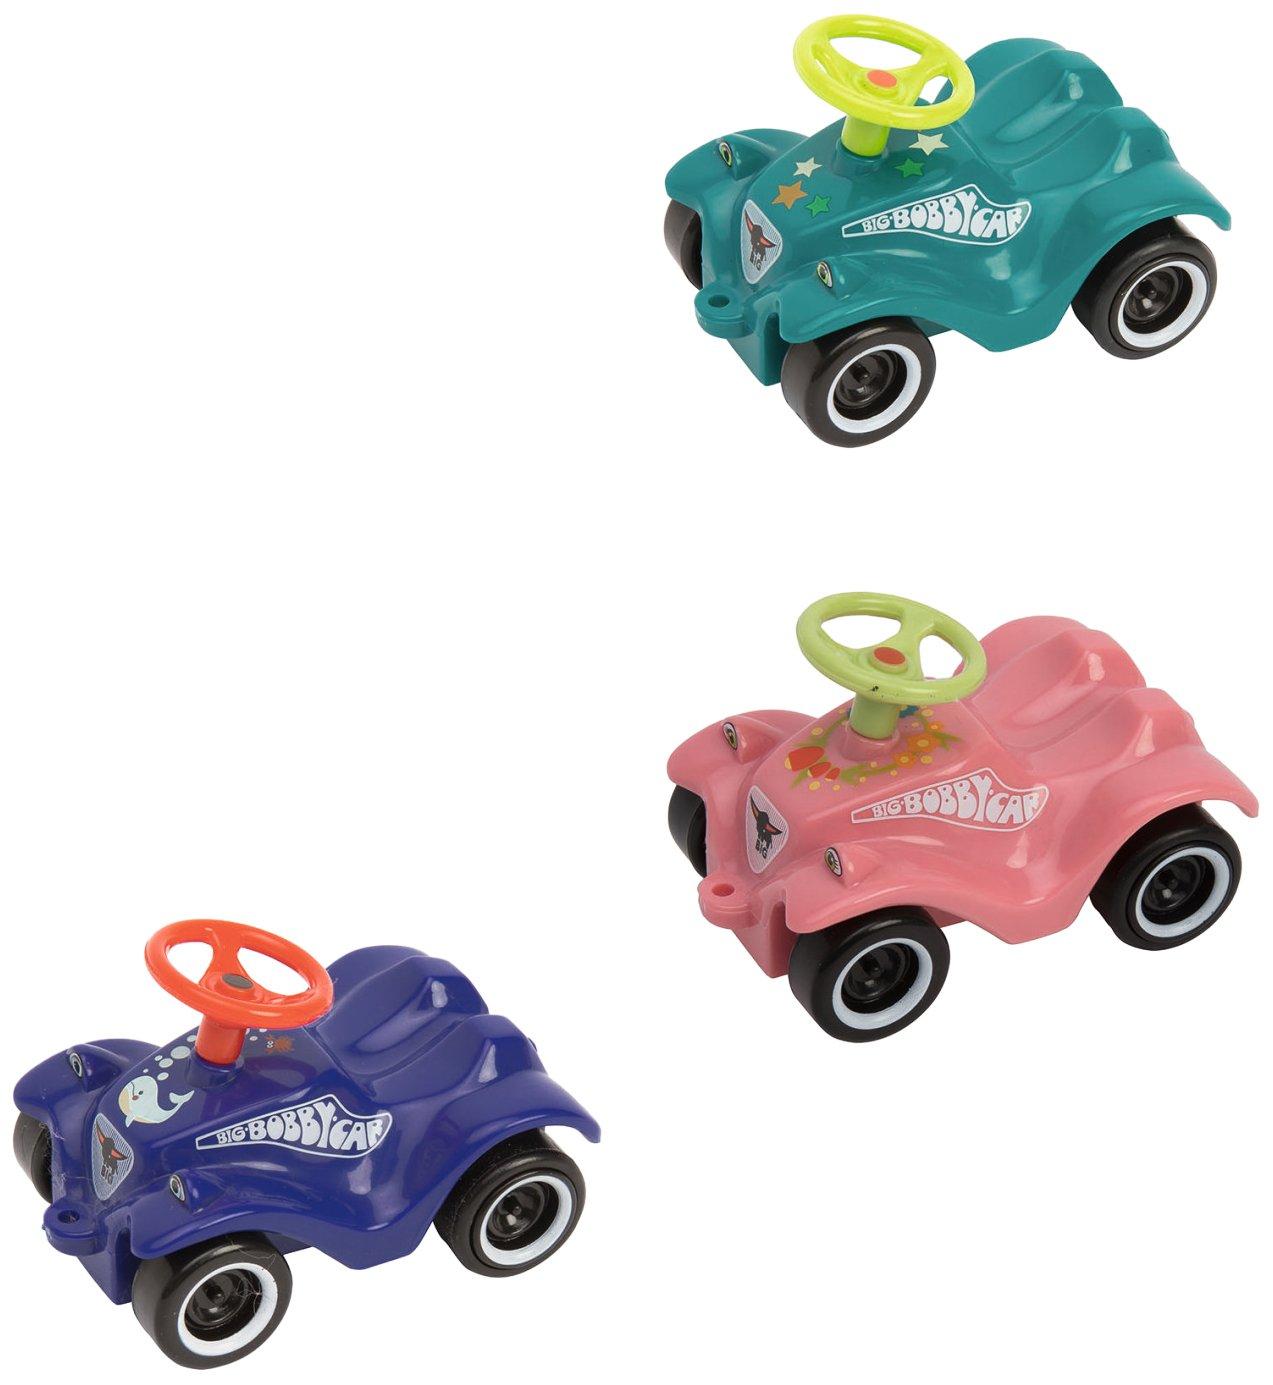 Bobby Car Kinderfahrzeuge Suche Nach FlüGen Big-bobby-car-classic